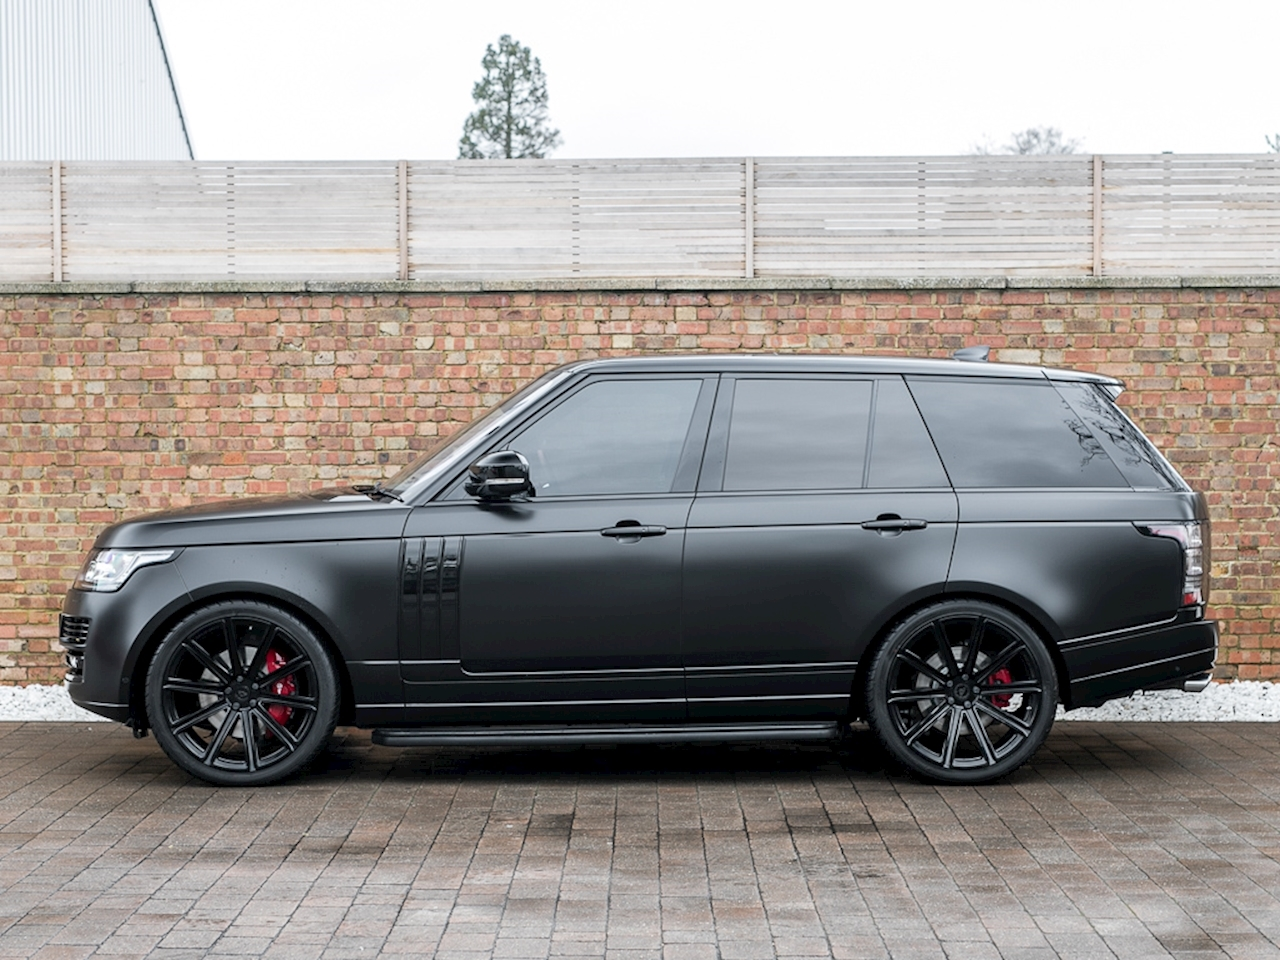 luxury cars: black Range rover